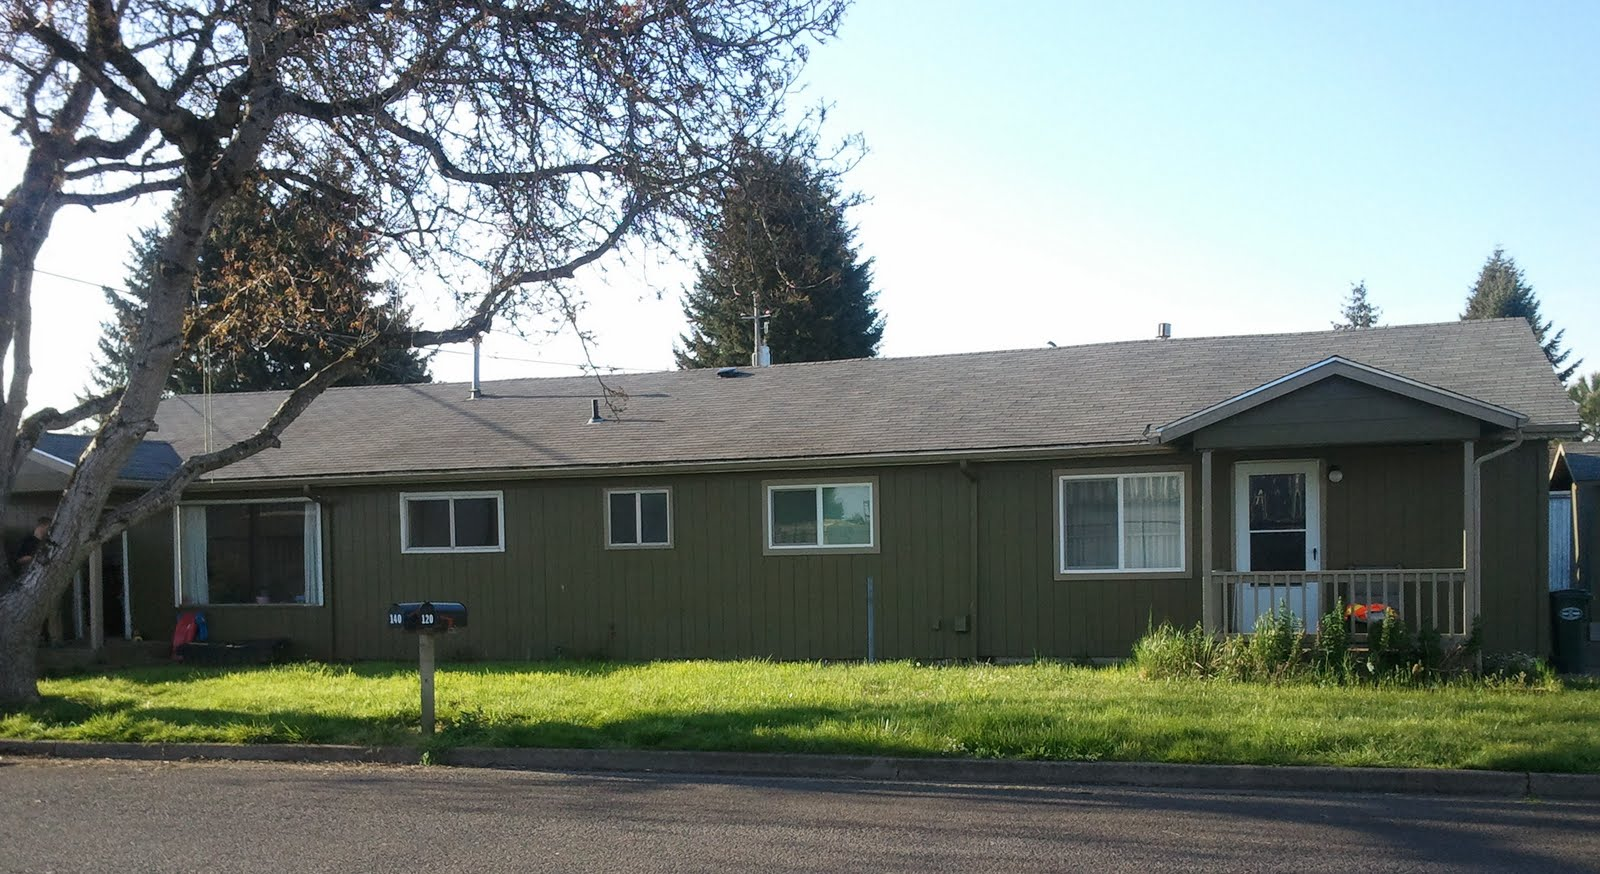 Real Estate Information Waiting For You 2 Bedroom 1 Bath Duplex For Rent In Junction City Oregon